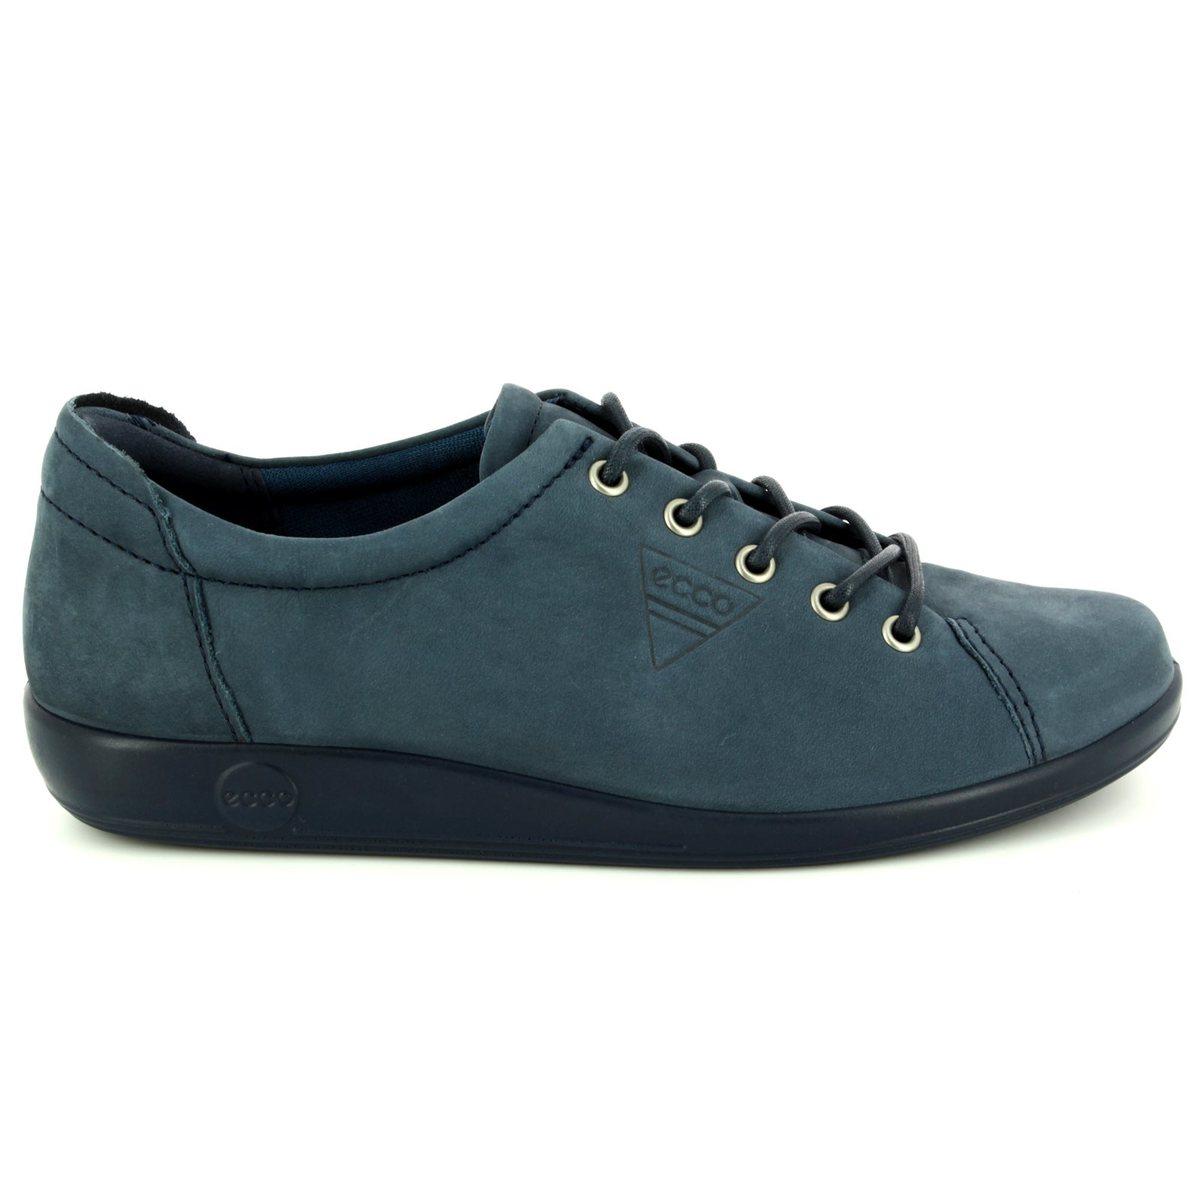 ceb6147d32ed ECCO Lacing Shoes - Navy nubuck - 206503 02038 SOFT 2.0